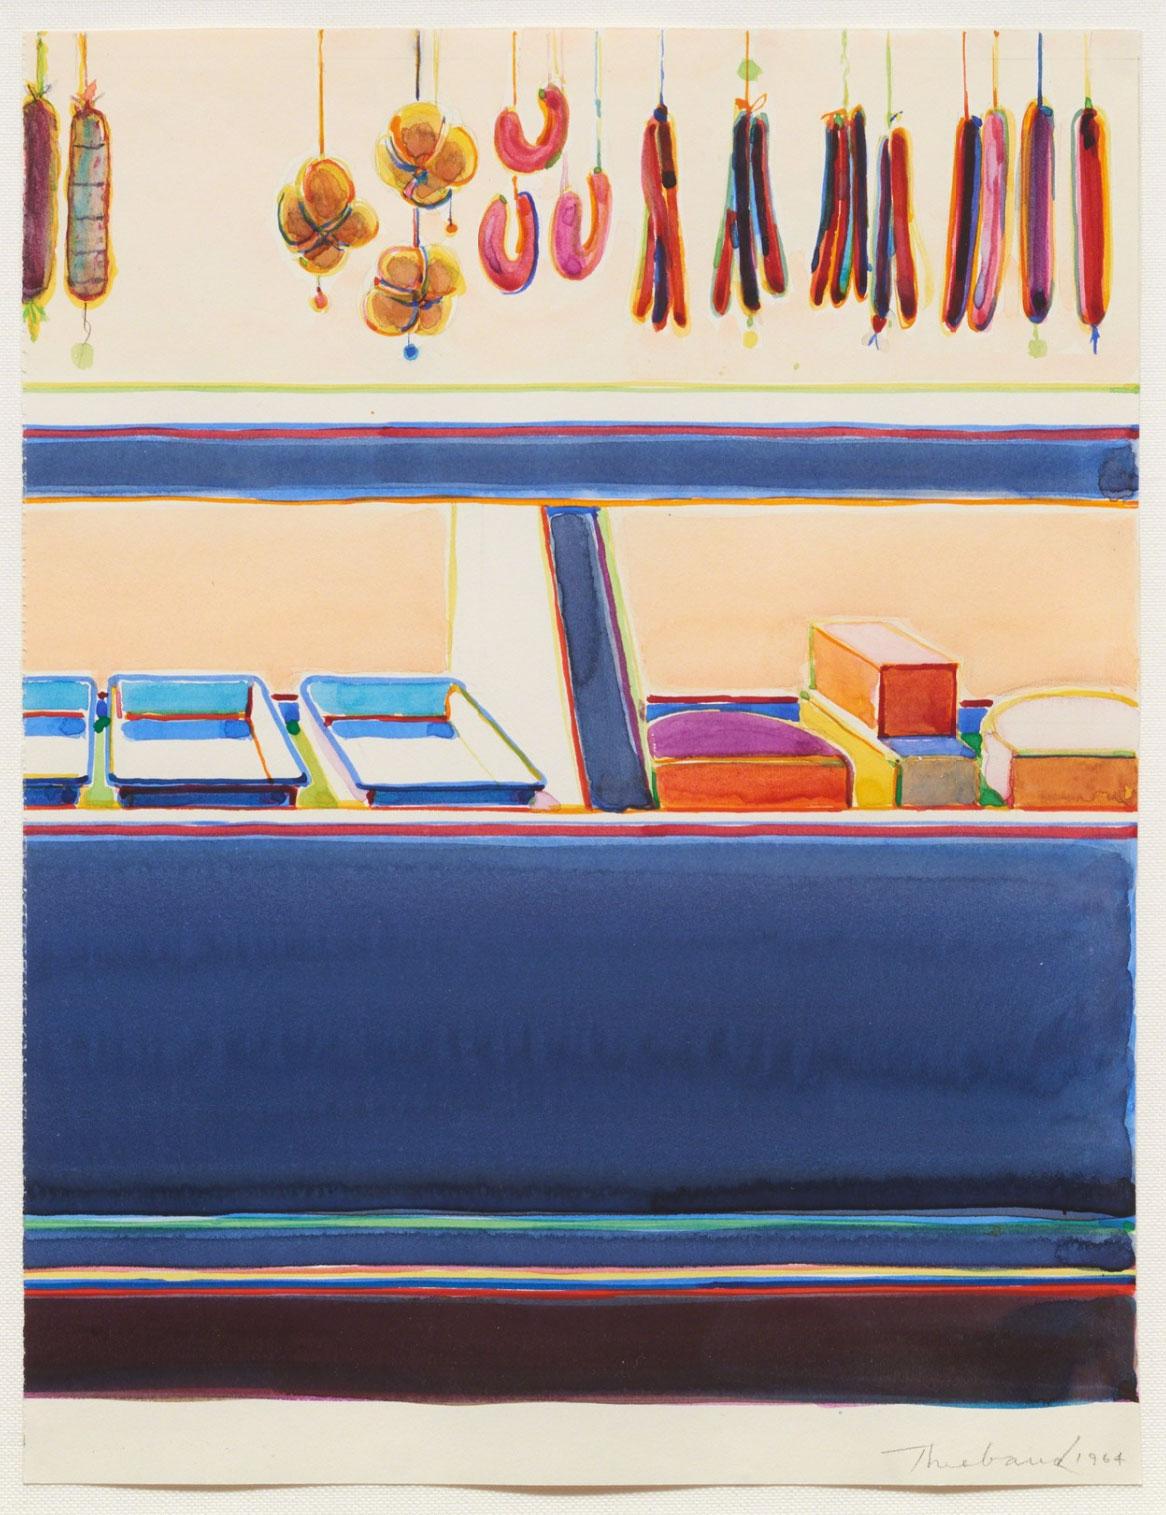 Wayne Thiebaud, Delicatessan Study